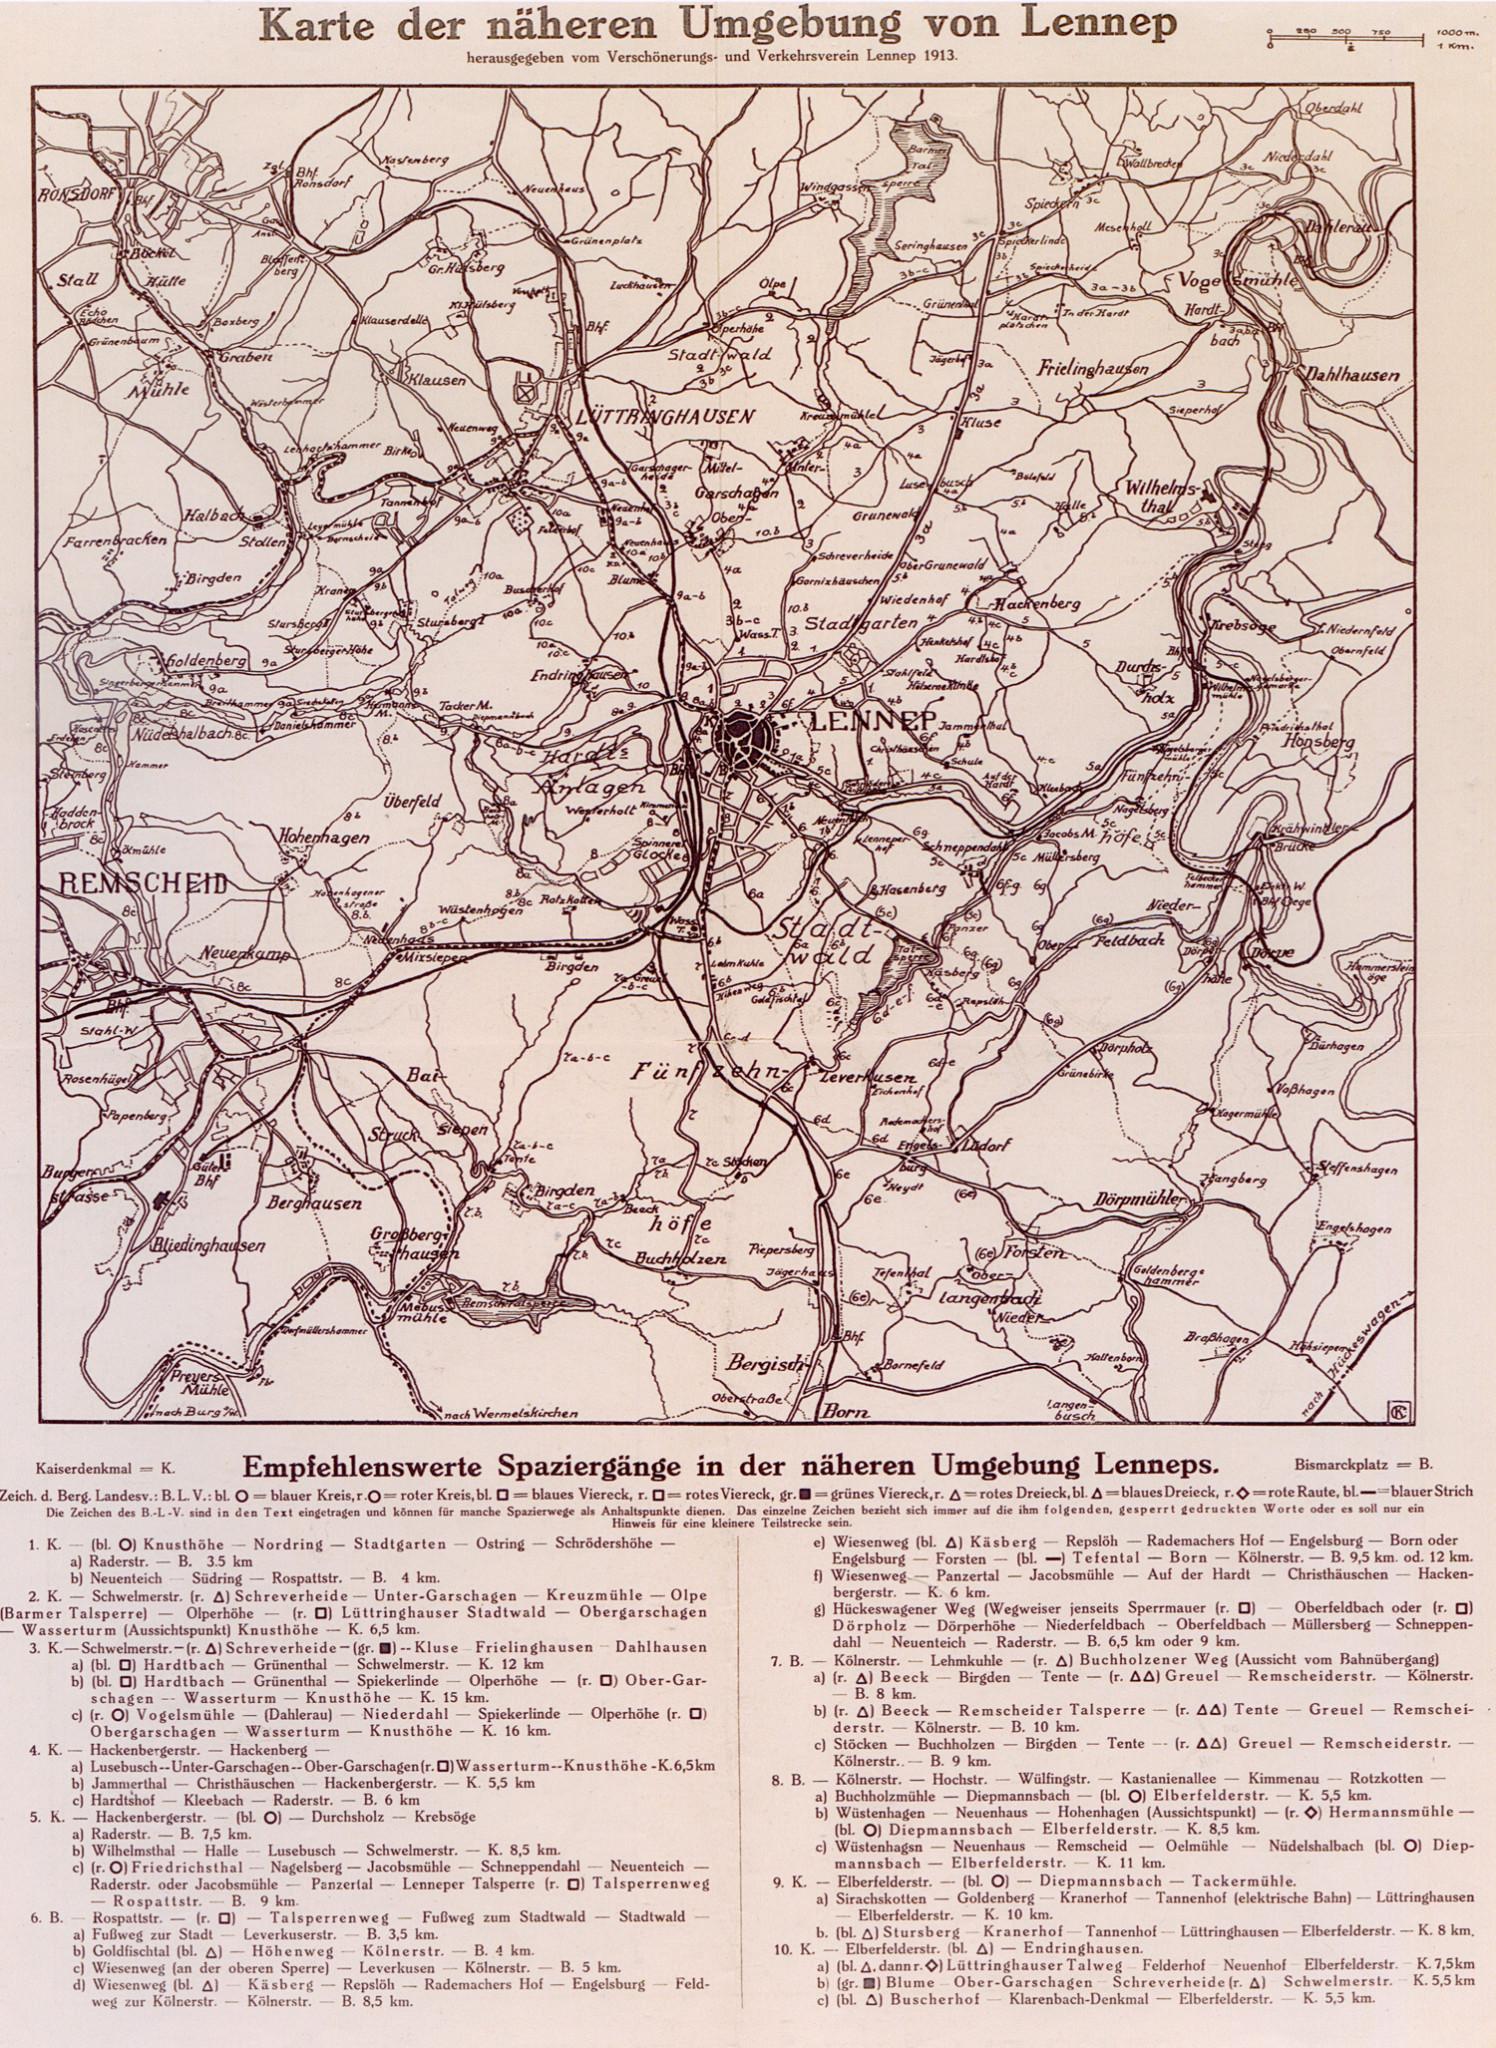 Abb. 1 Karte